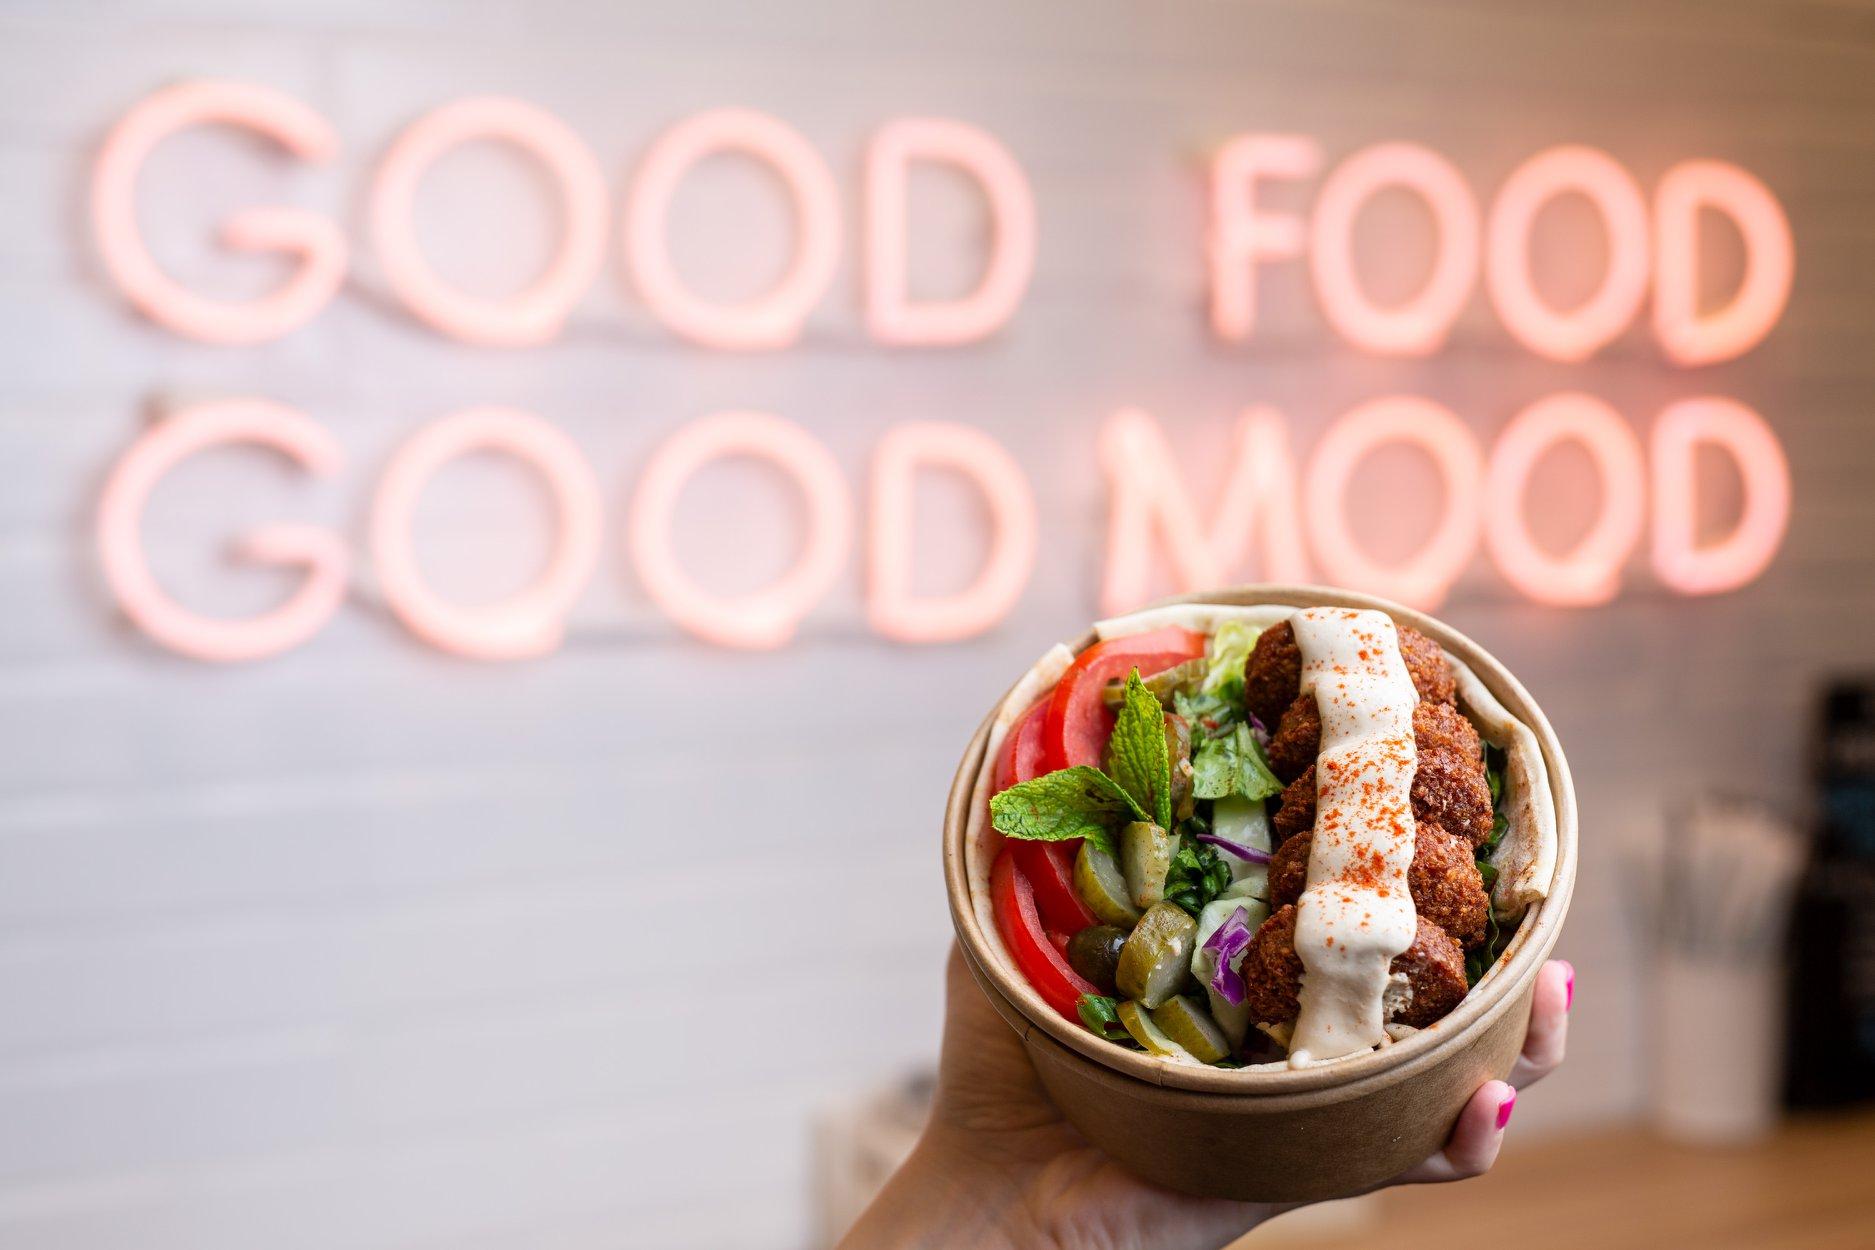 «Falafel House»: Εκεί που ο χορτοφάγος θα νιώσει σαν στο σπίτι του